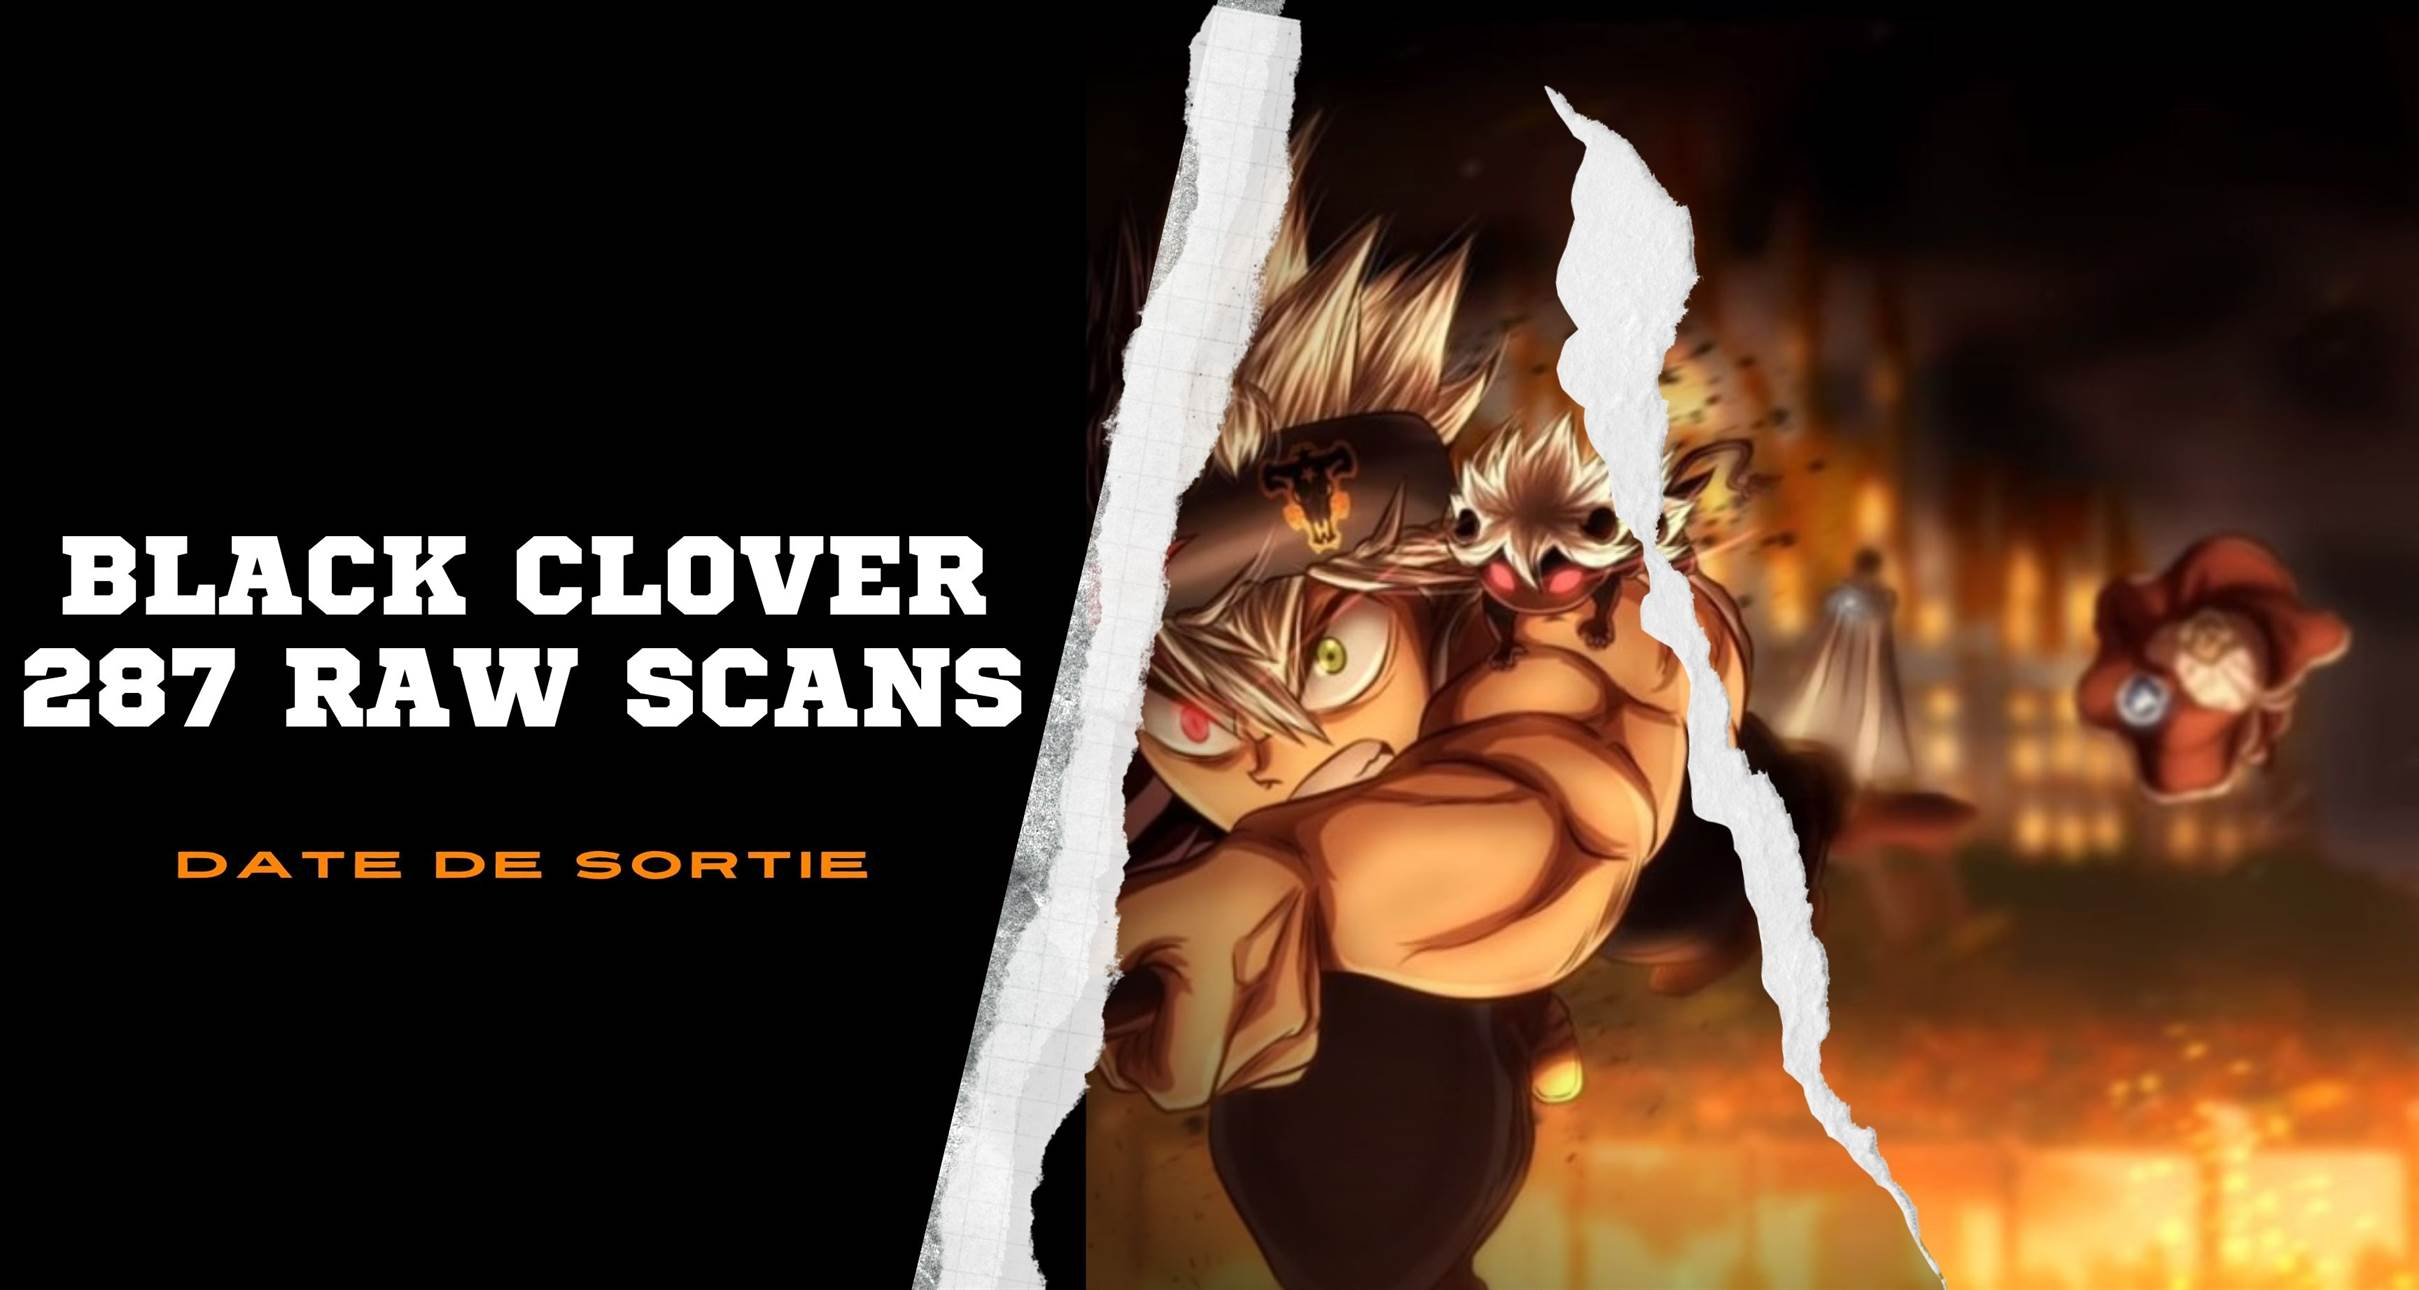 Black Clover 287 raw scans